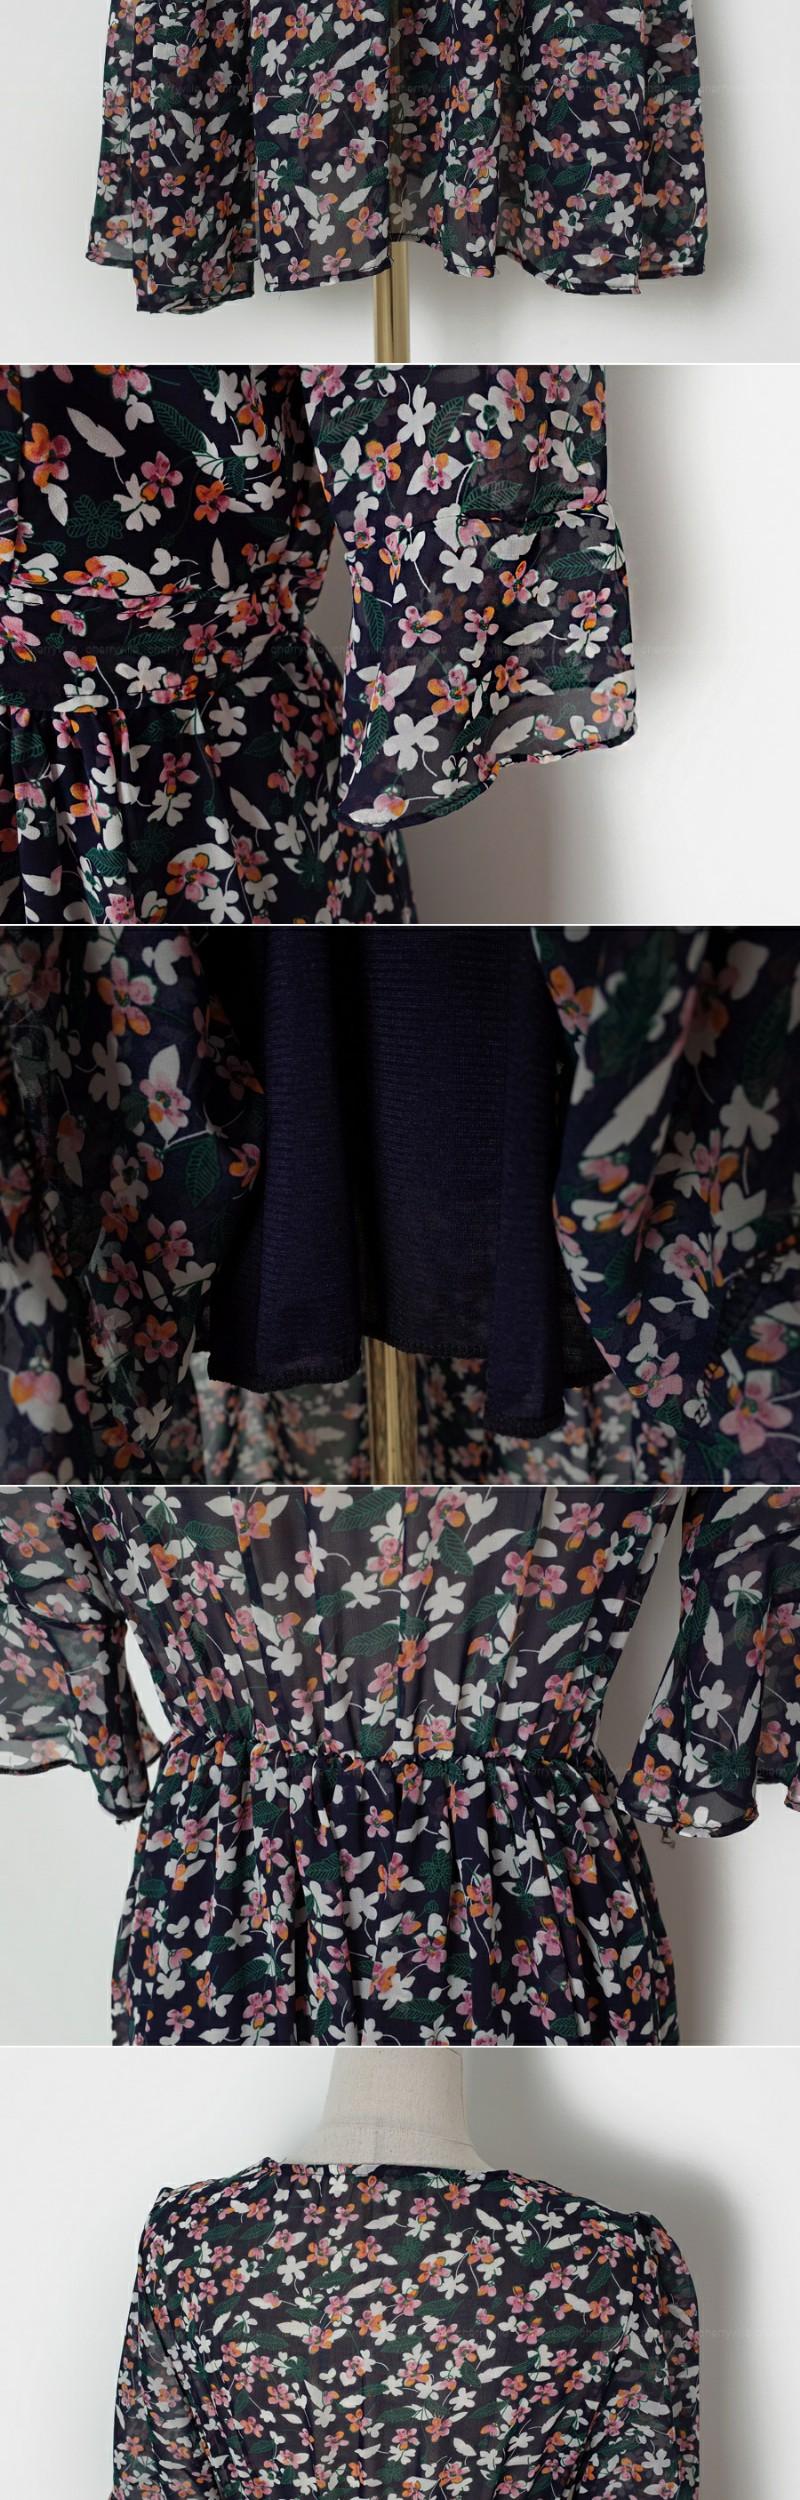 Slightly see-through dress